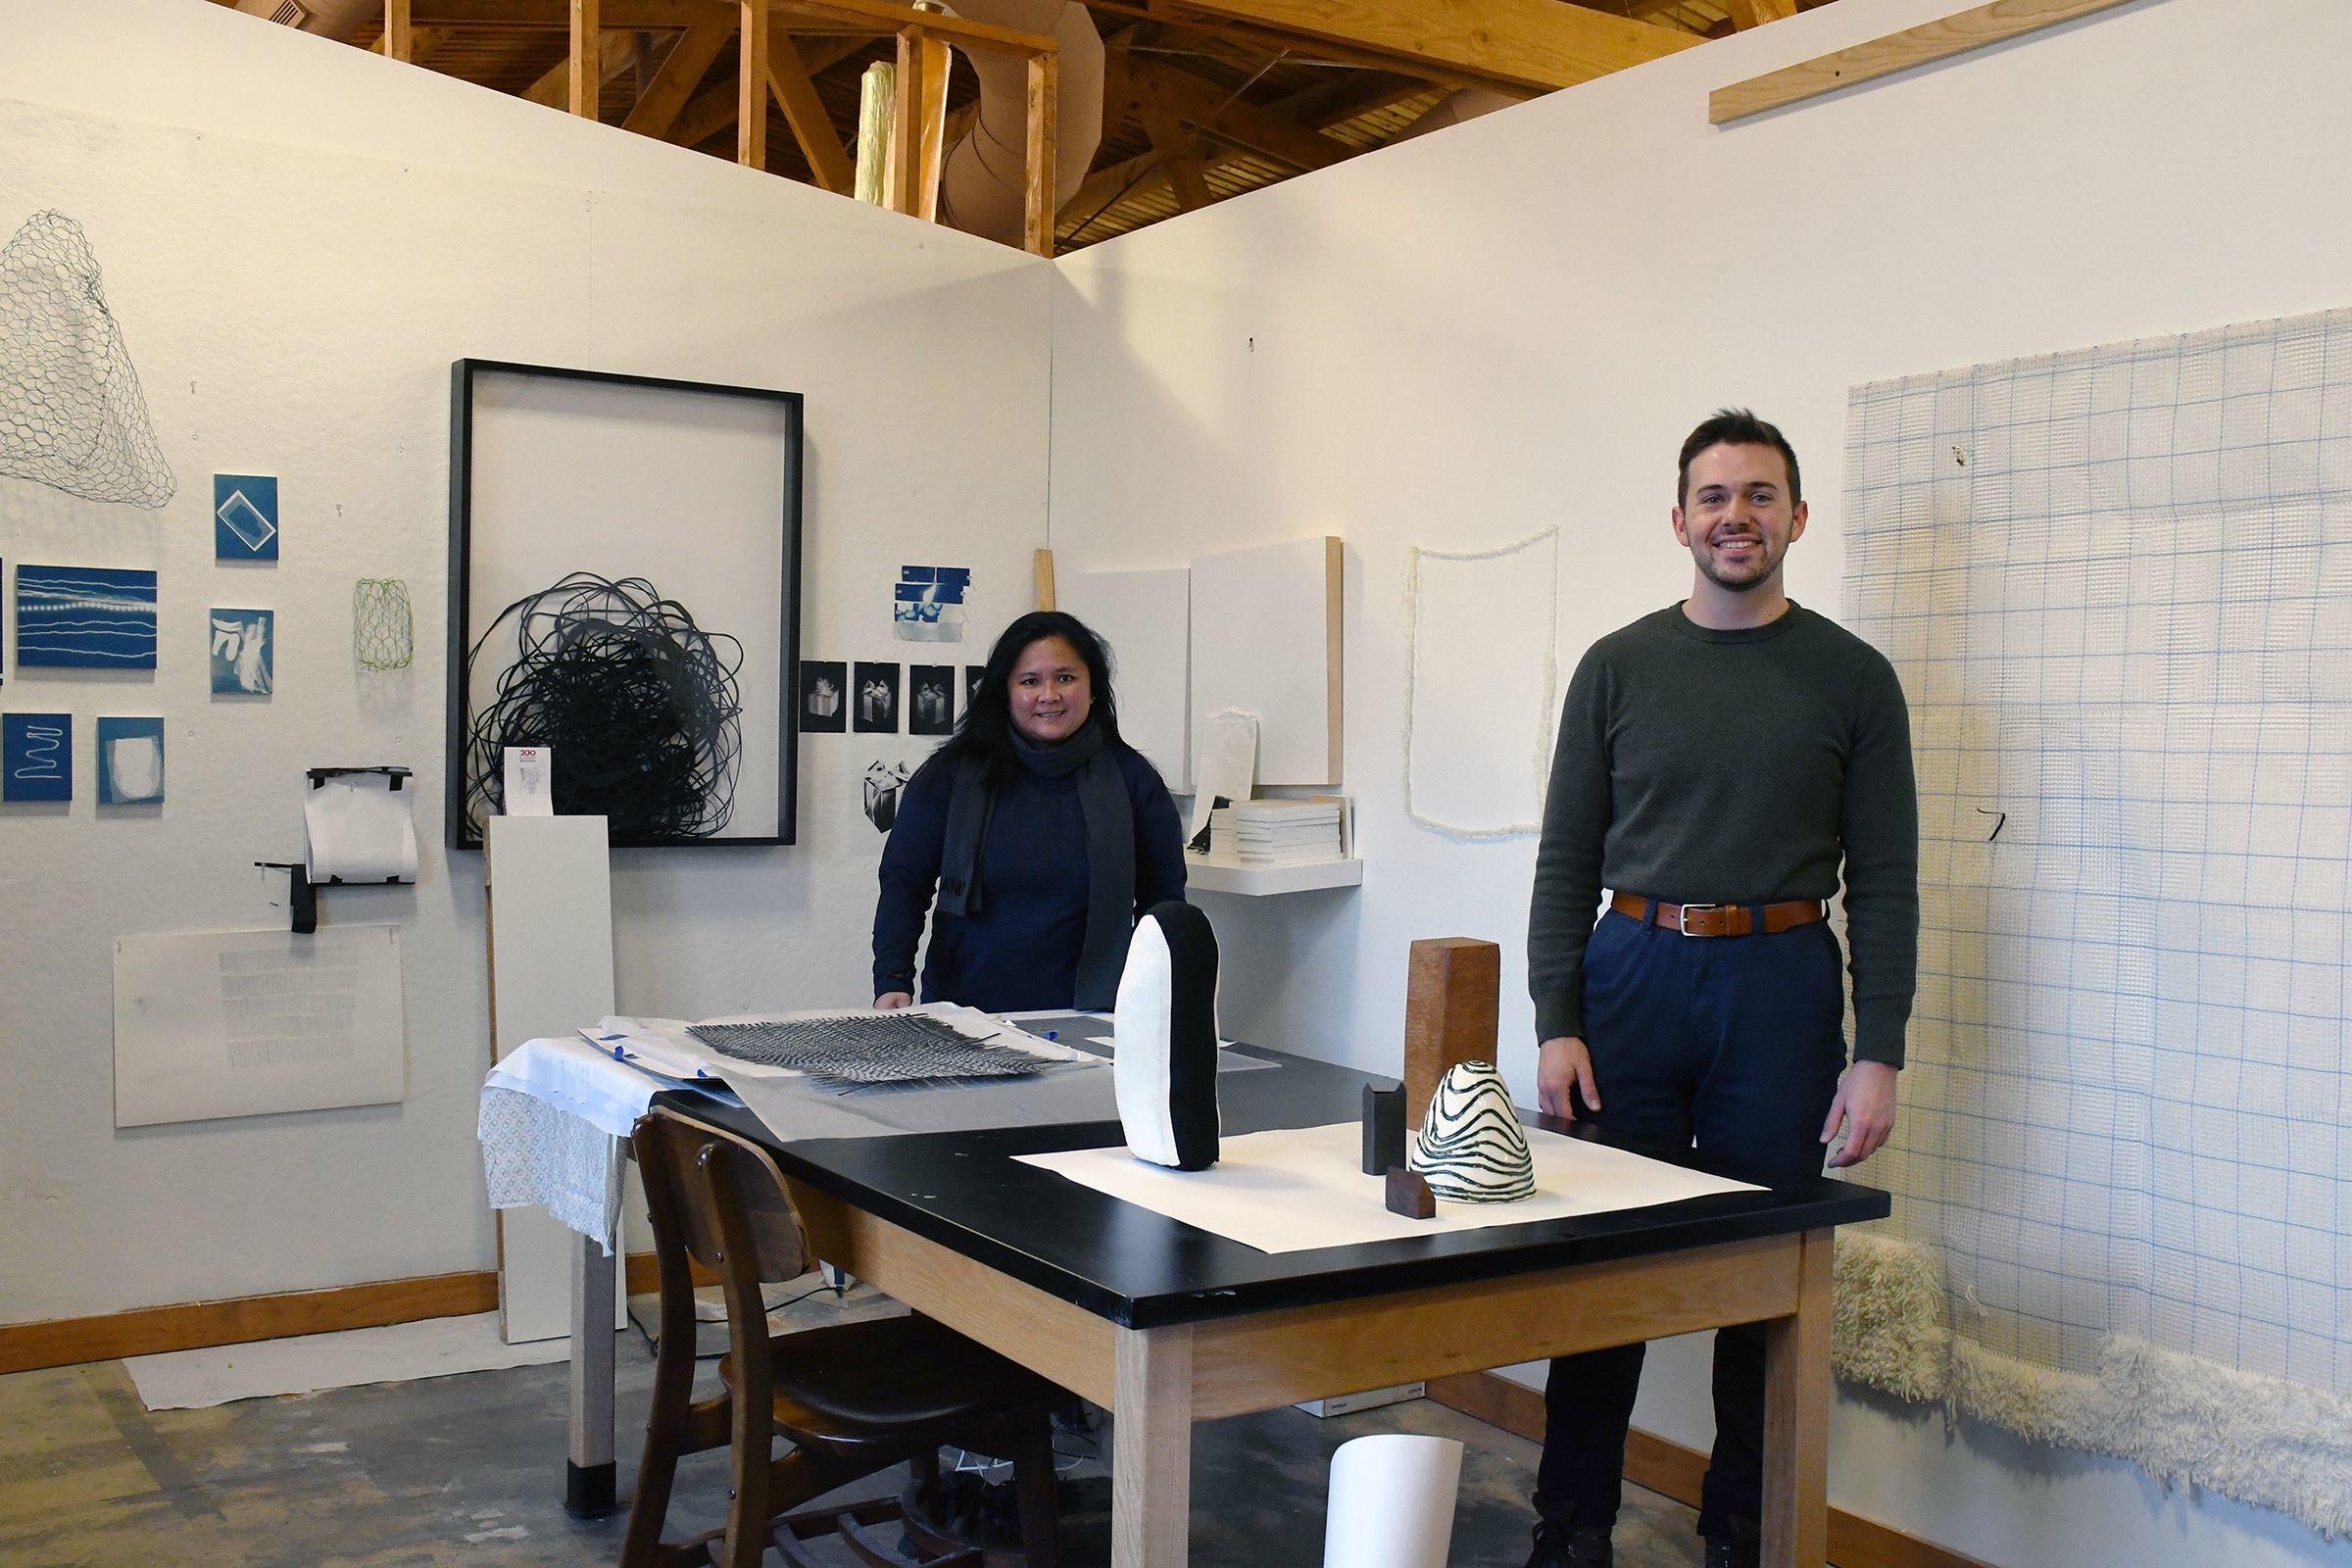 Artists Hannah Israel and Dalton Newbend in studio